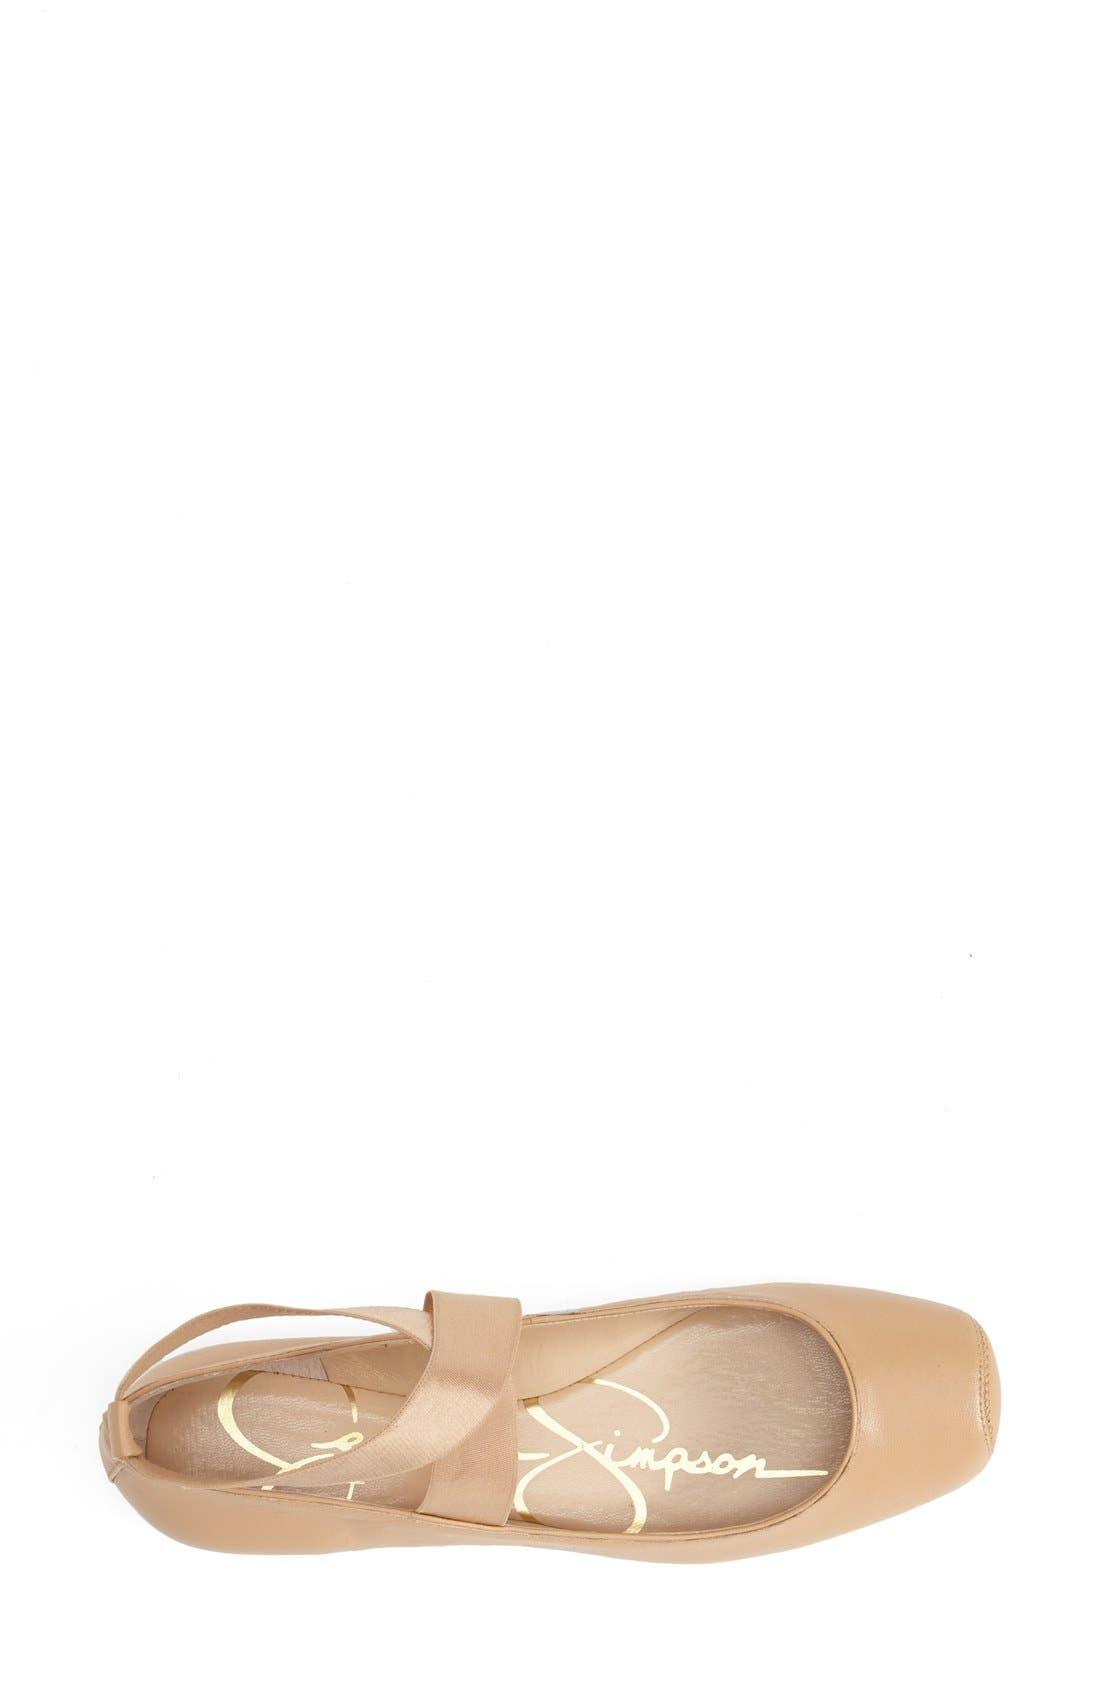 Alternate Image 3  - Jessica Simpson 'Mandalaye' Leather Flat